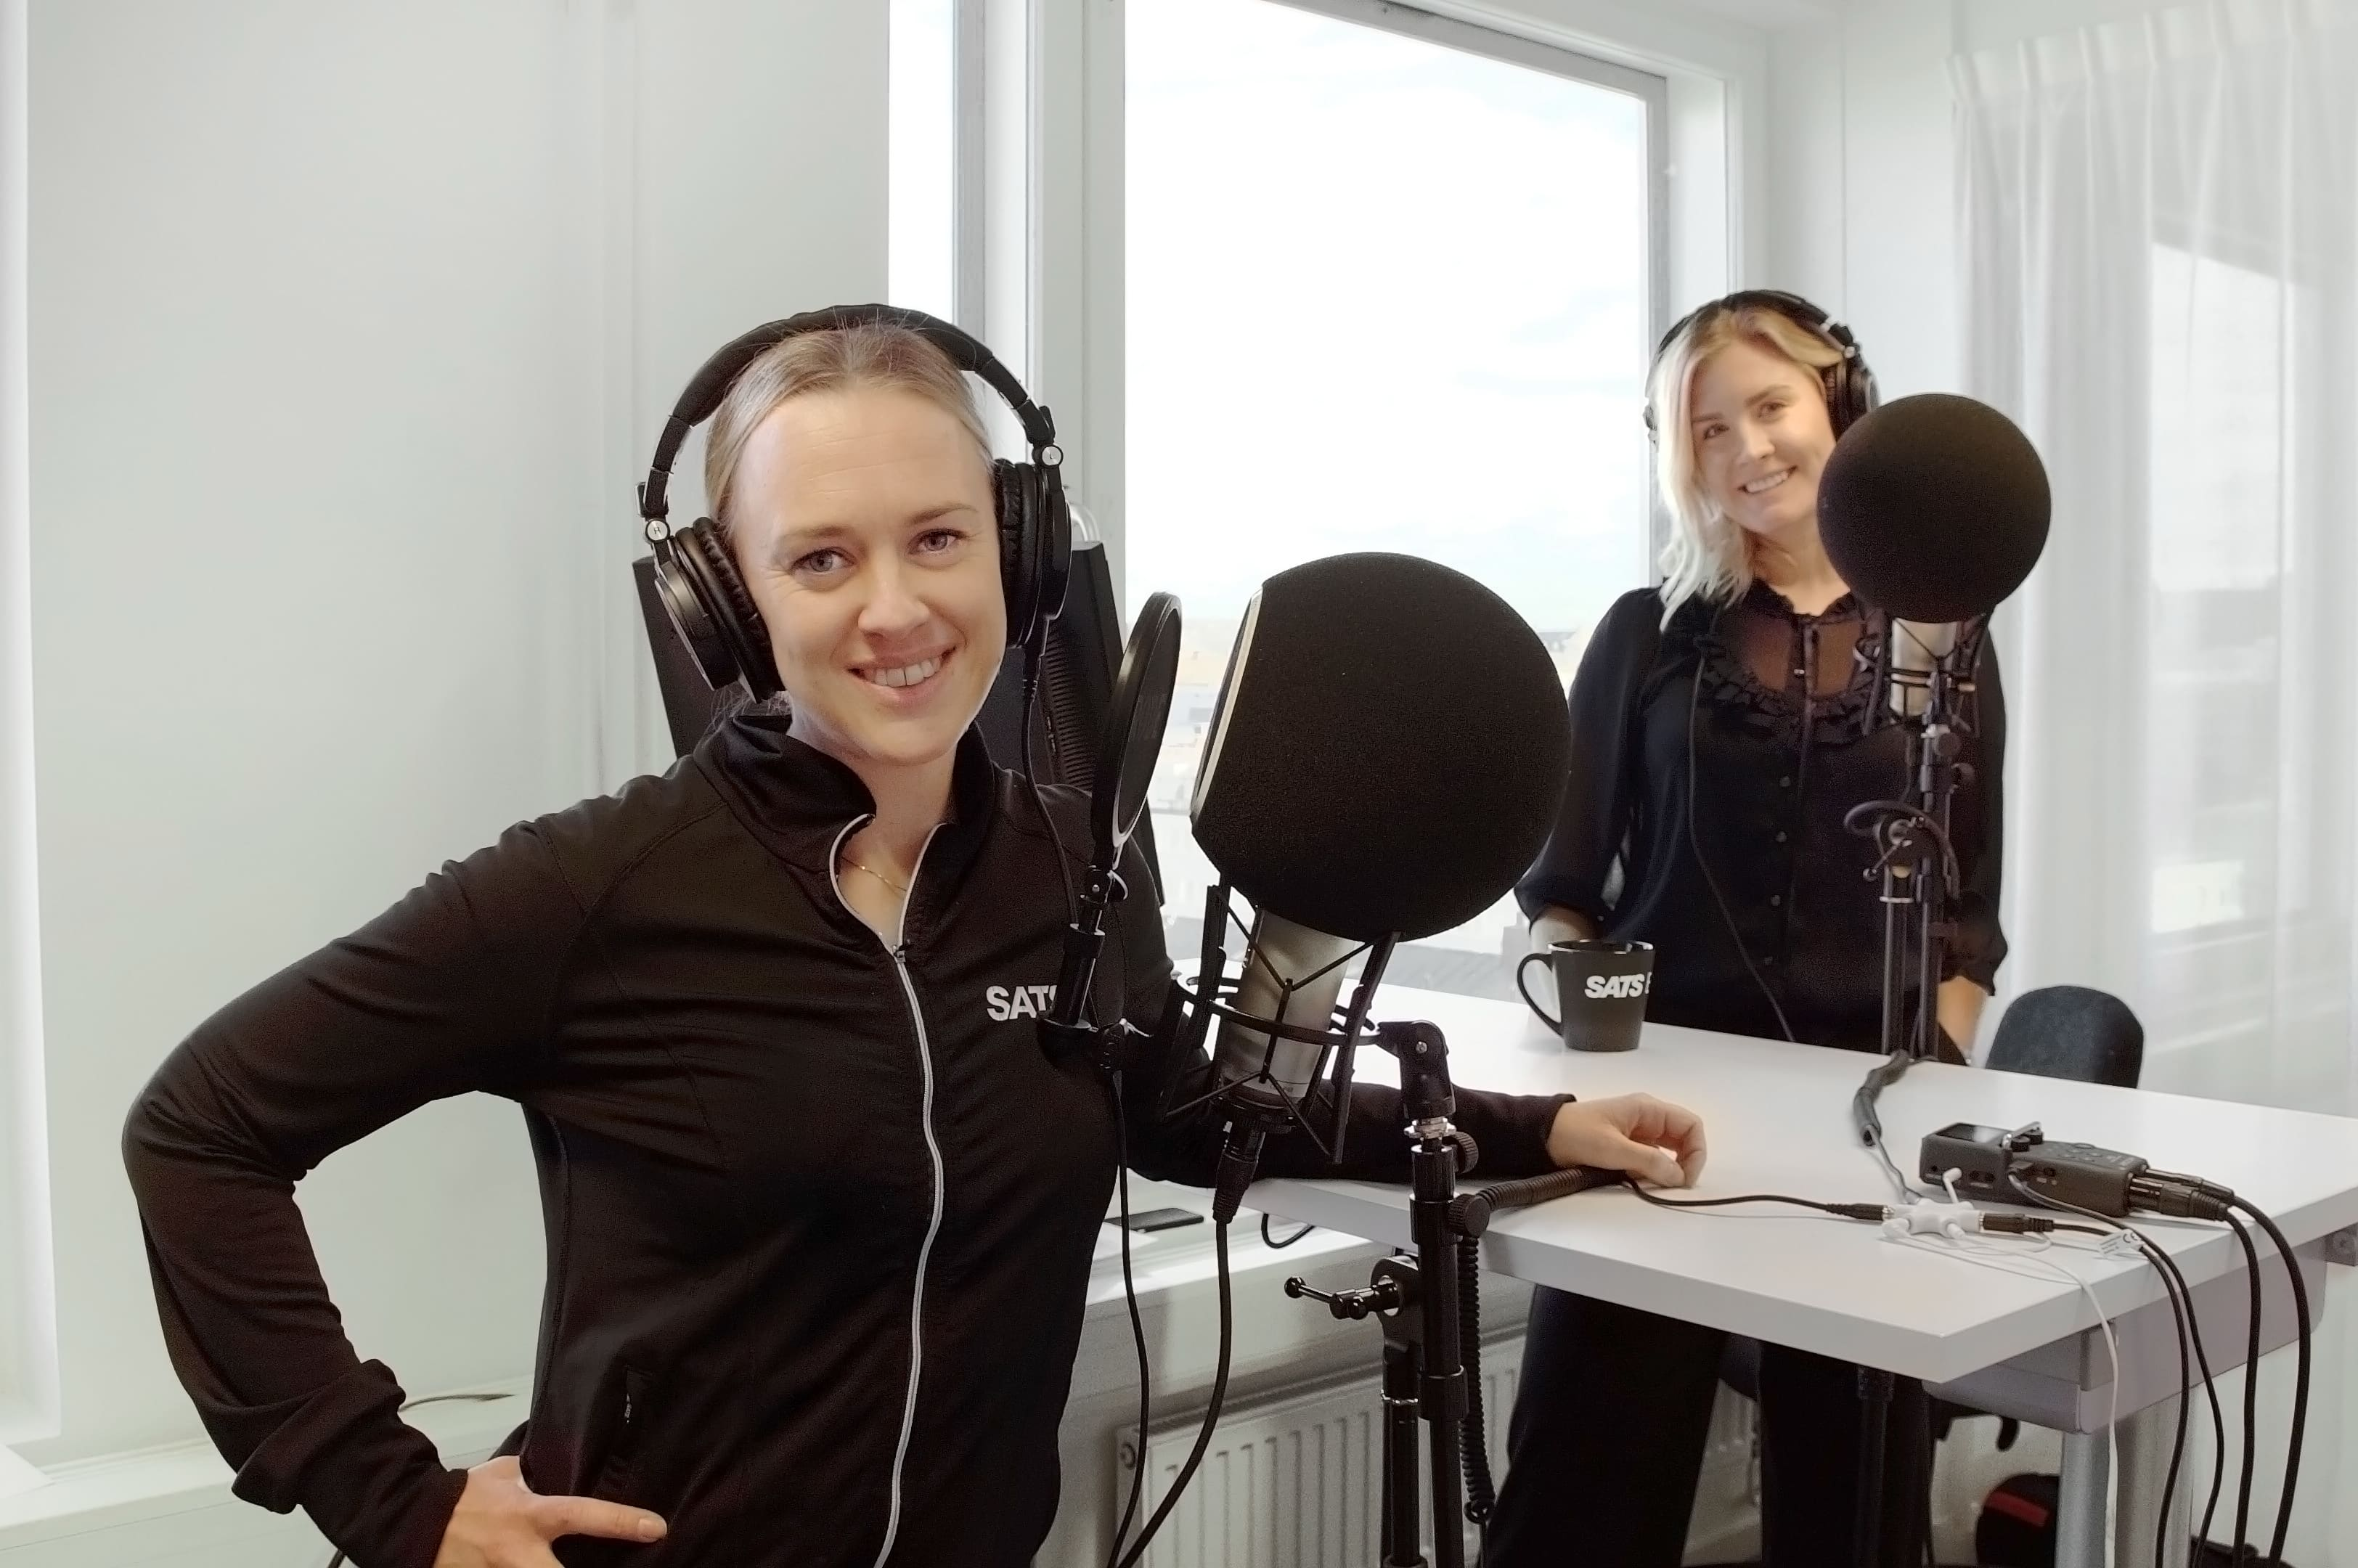 12. Gå ner i vikt med SATS PT och dietist Kristine Symreng